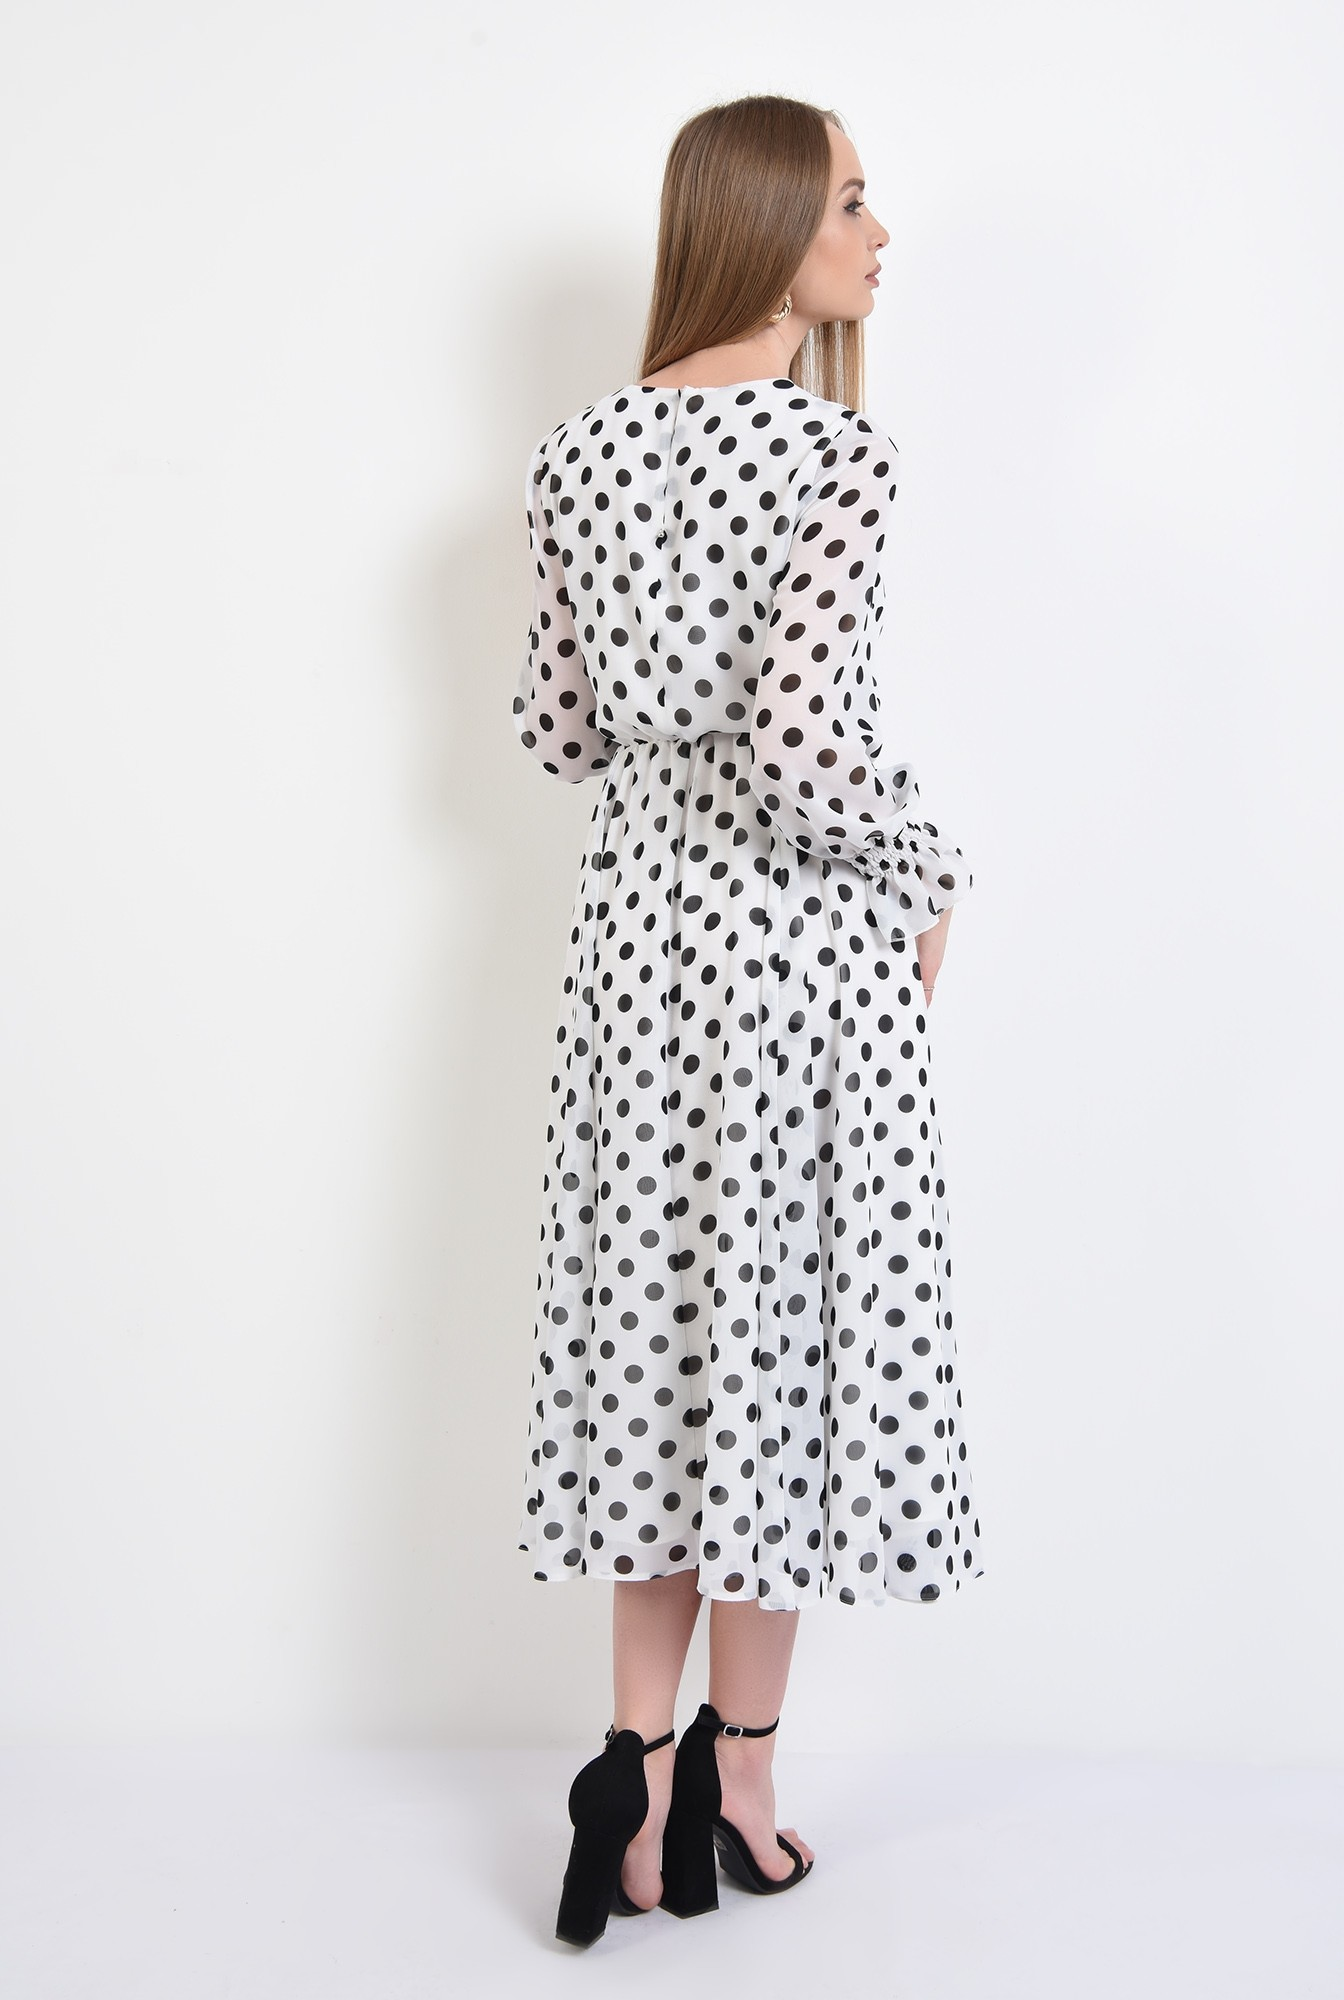 1 - 360 - rochie lunga, clos, cu buline, alb-negru, mansete volan, Poema